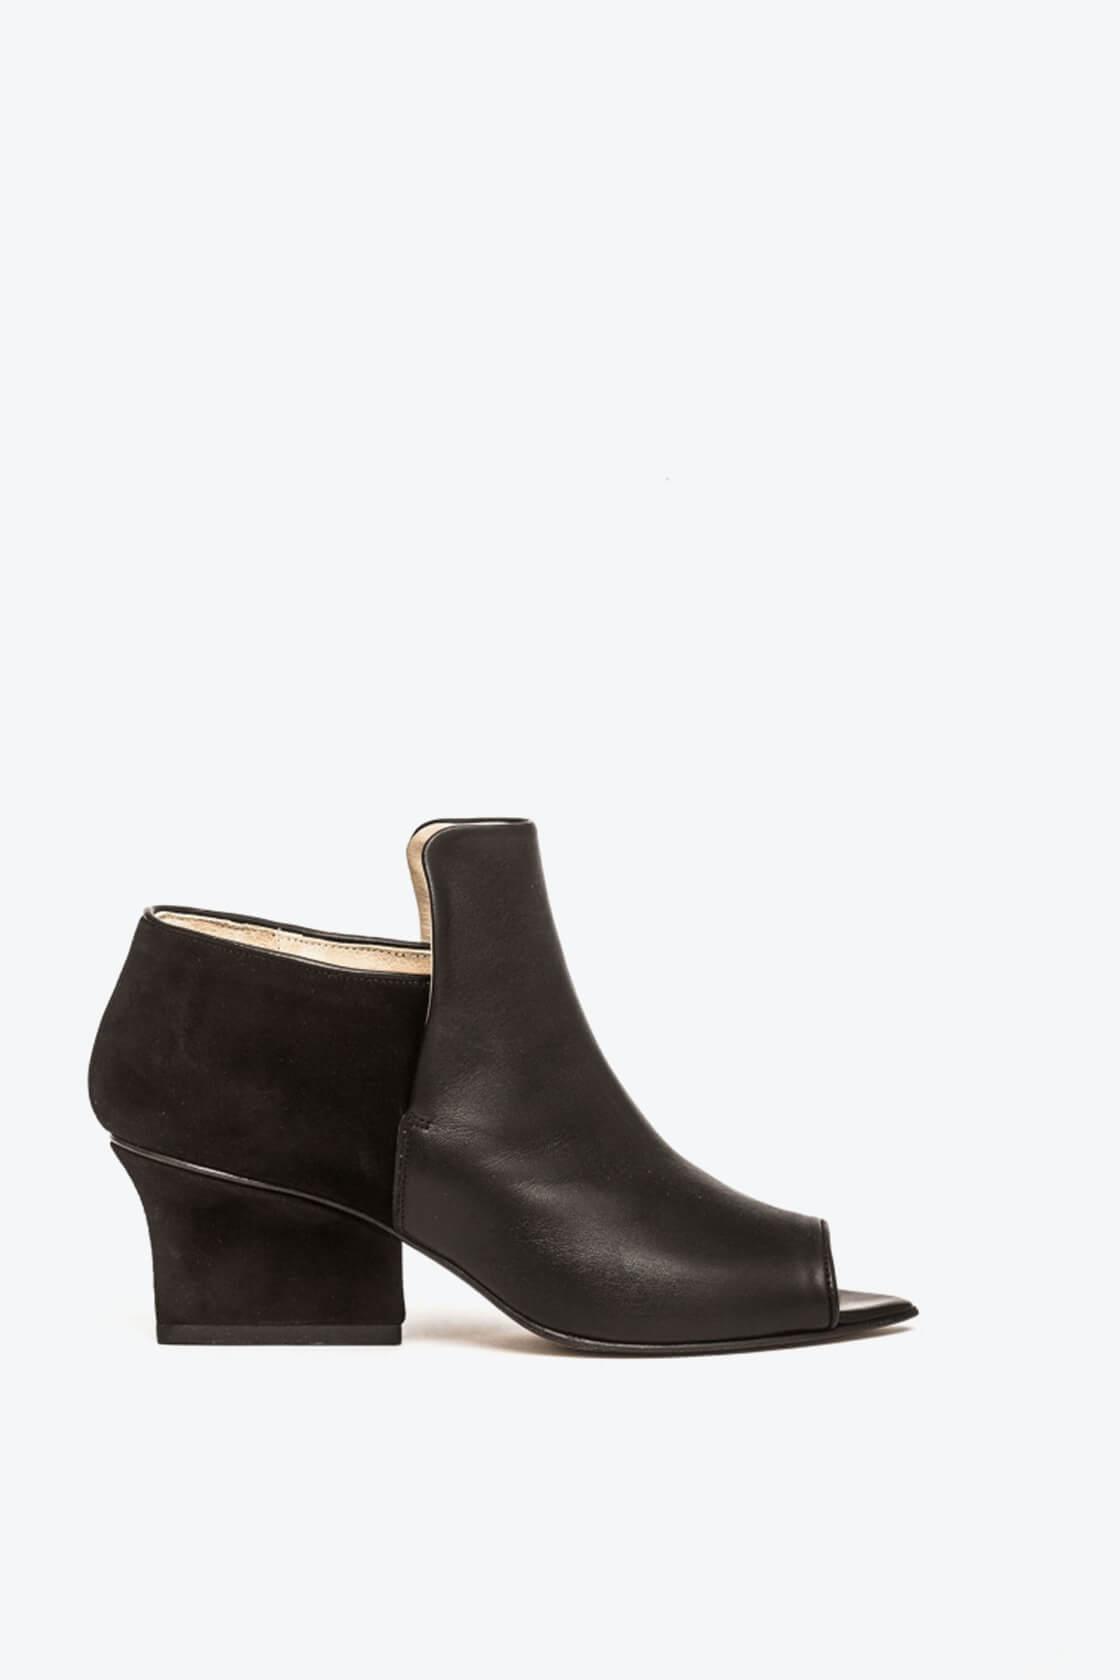 EJK0000018 Gwen ankle boots black 1